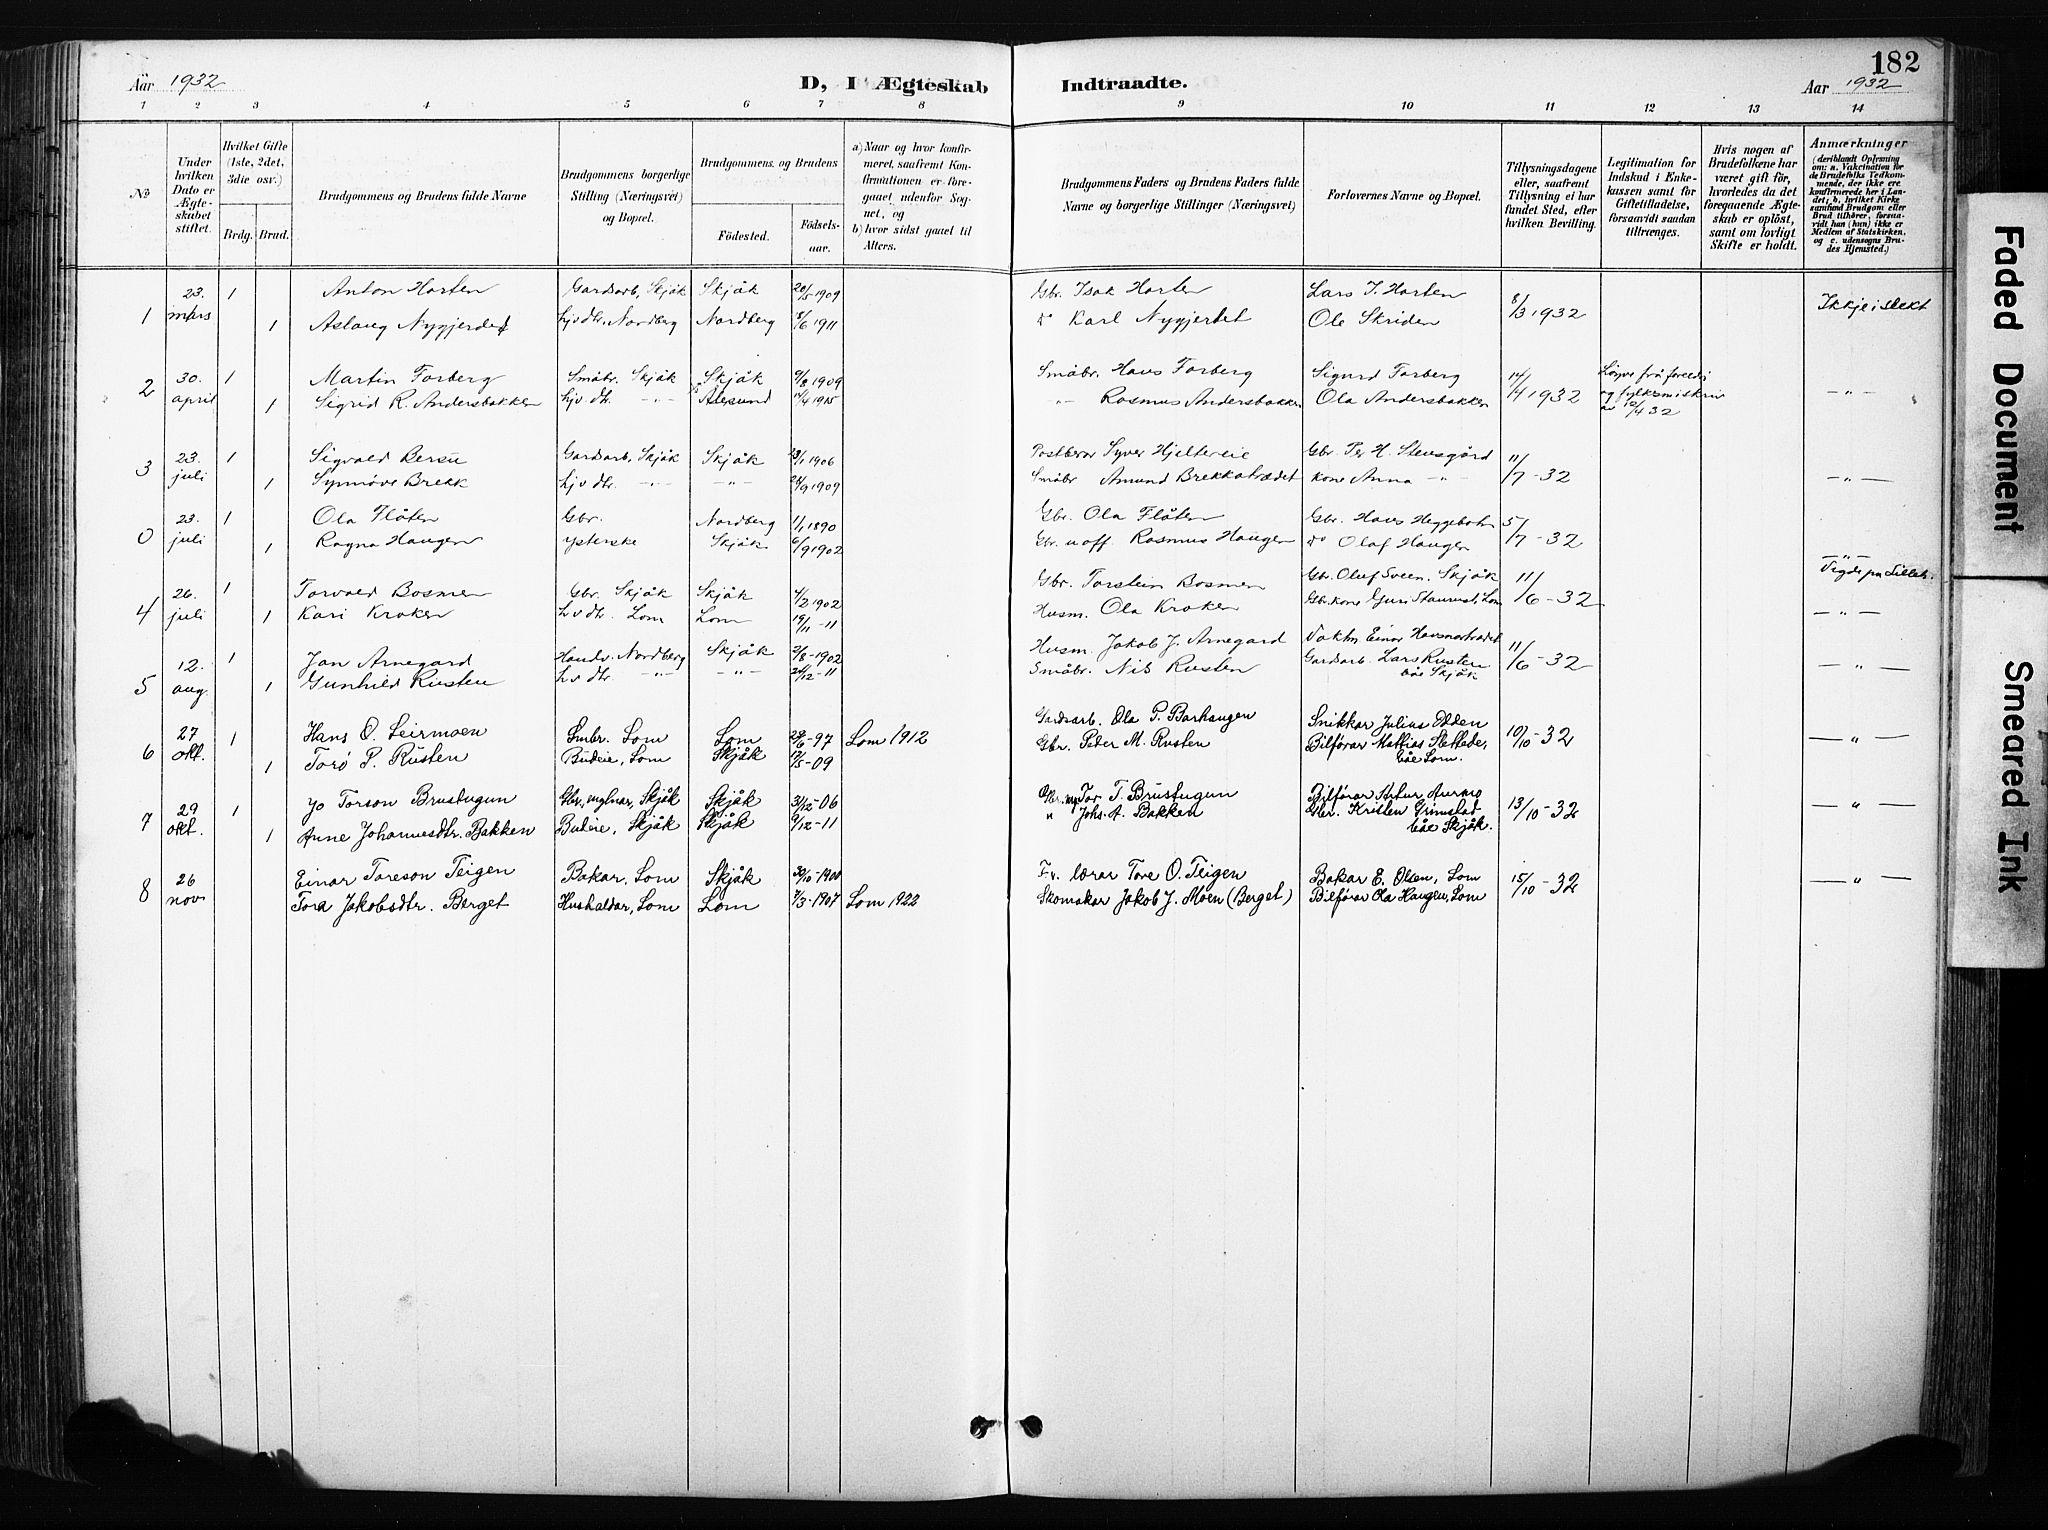 SAH, Skjåk prestekontor, Klokkerbok nr. 3, 1893-1932, s. 182